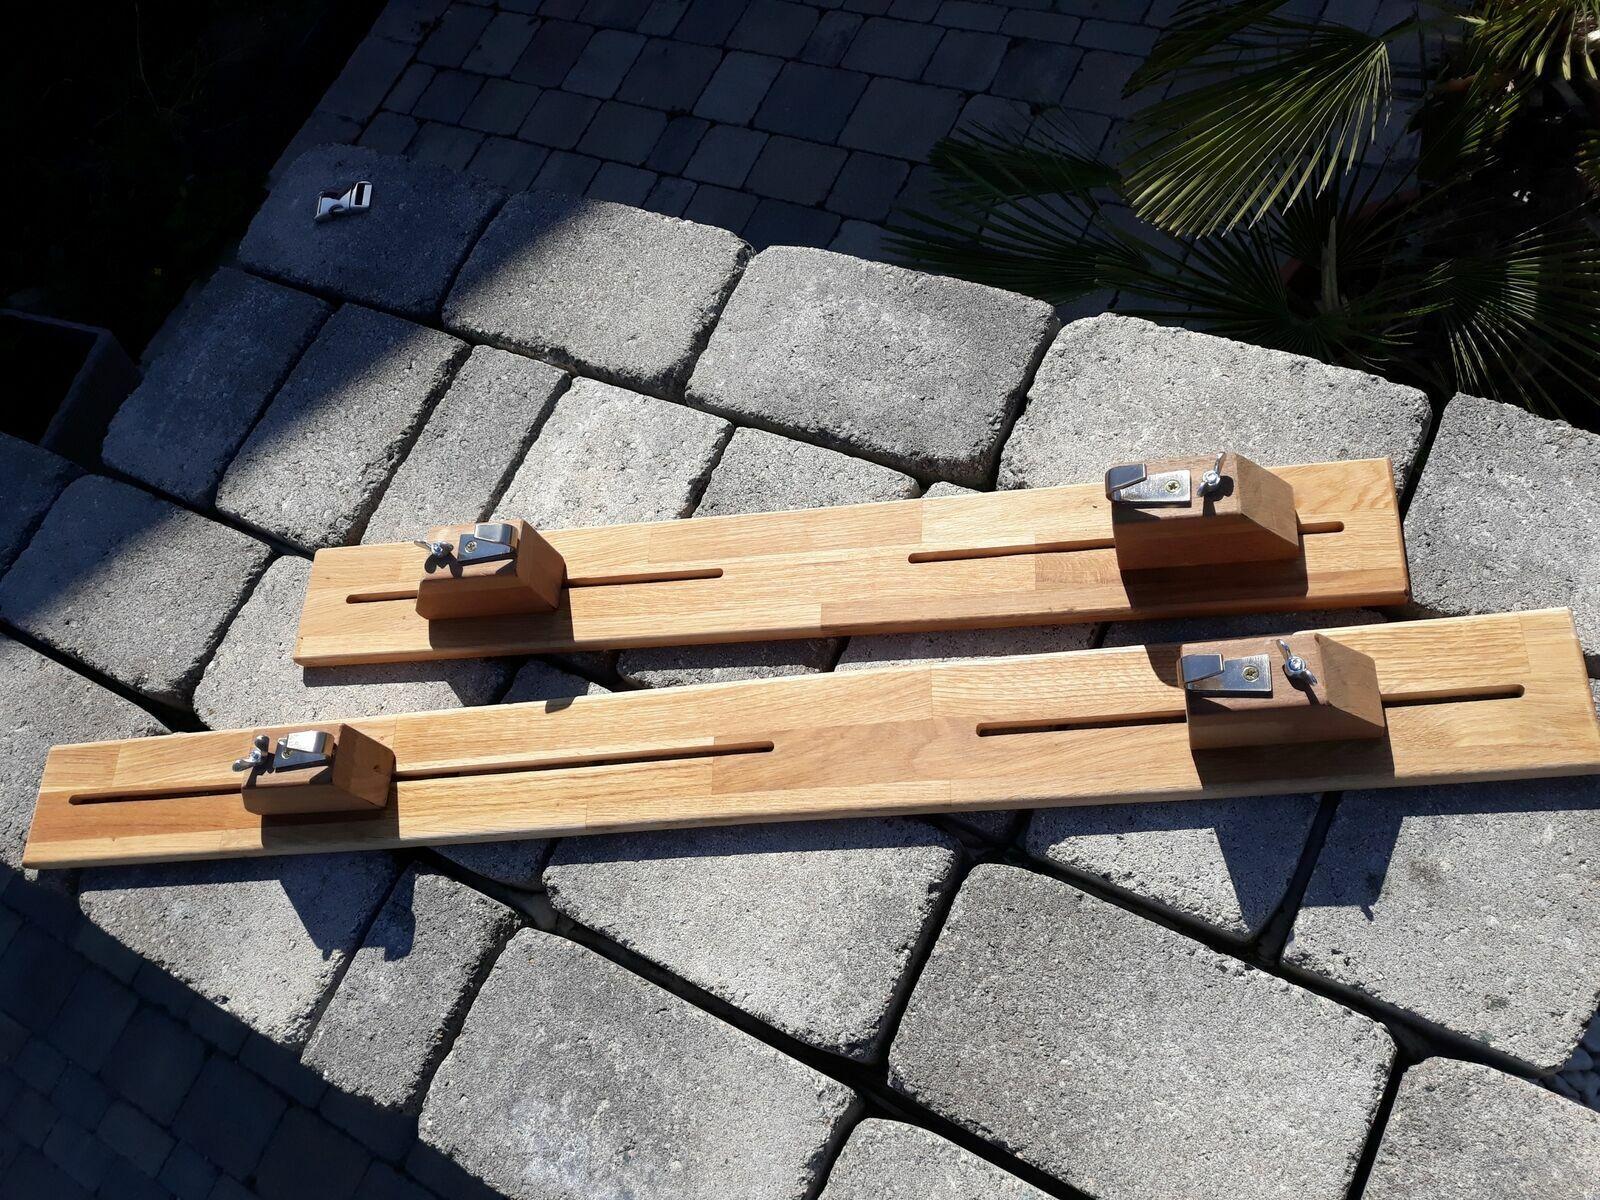 Paracord Jig Knüpfbrett Knüpfhilfe aus Holz - induviduell gestalten